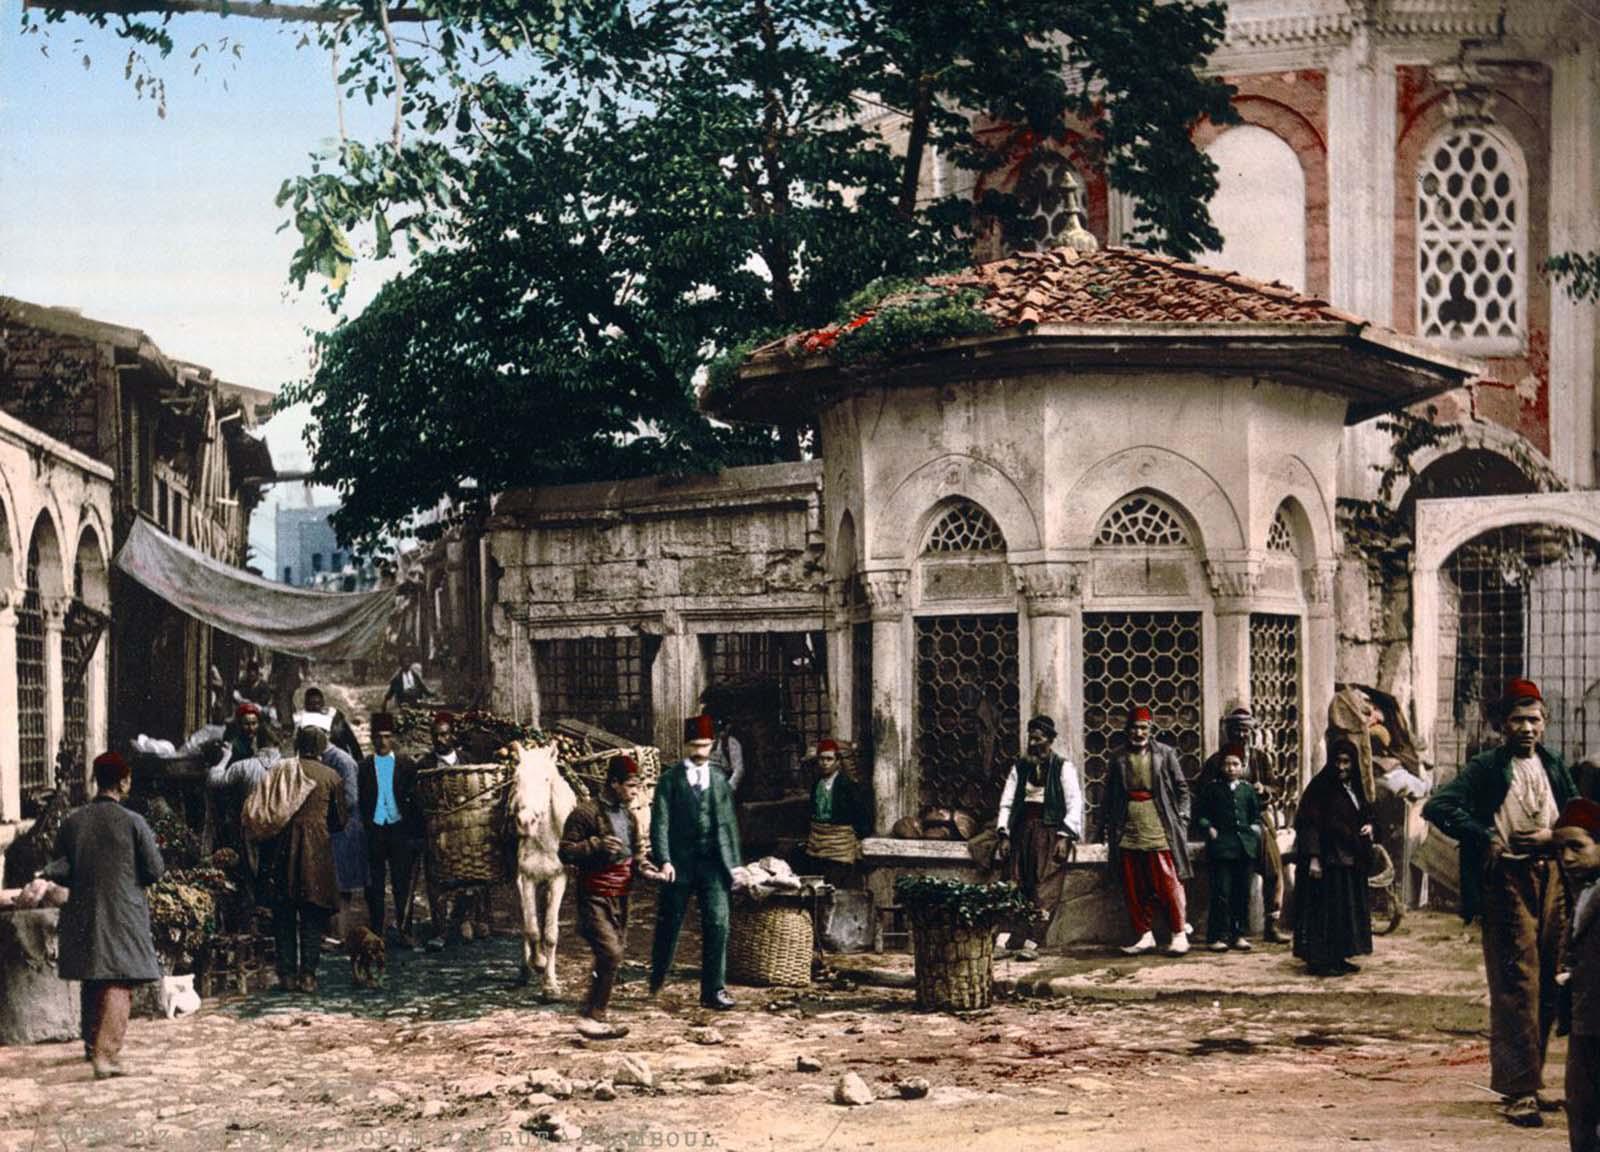 The Koca Sinan Pasha complex.